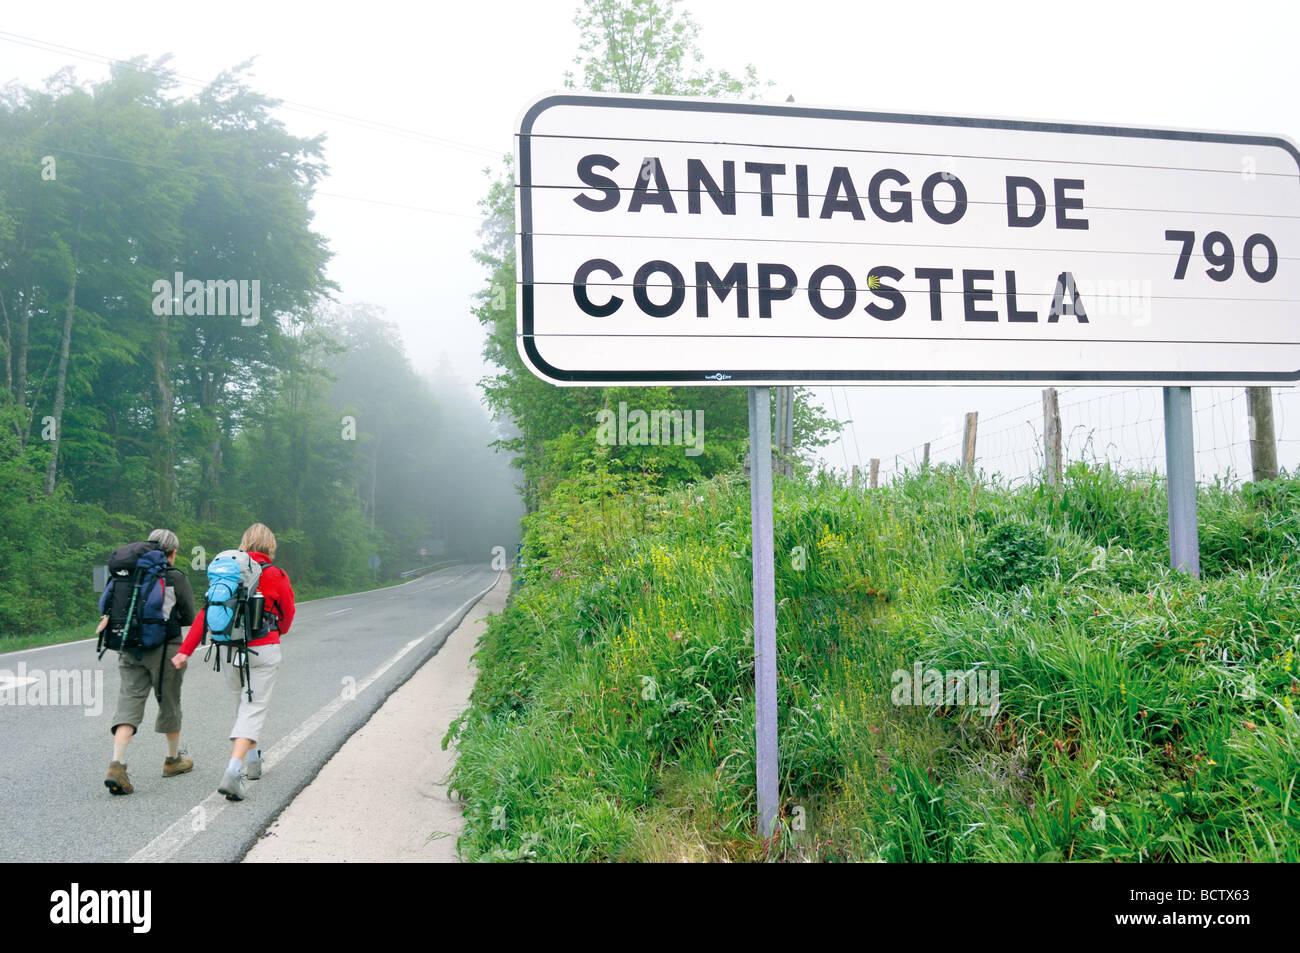 Spain, St. James Way, Navarra: Pilgrims on the way to Santiago de Compostela in Roncesvalles - Stock Image